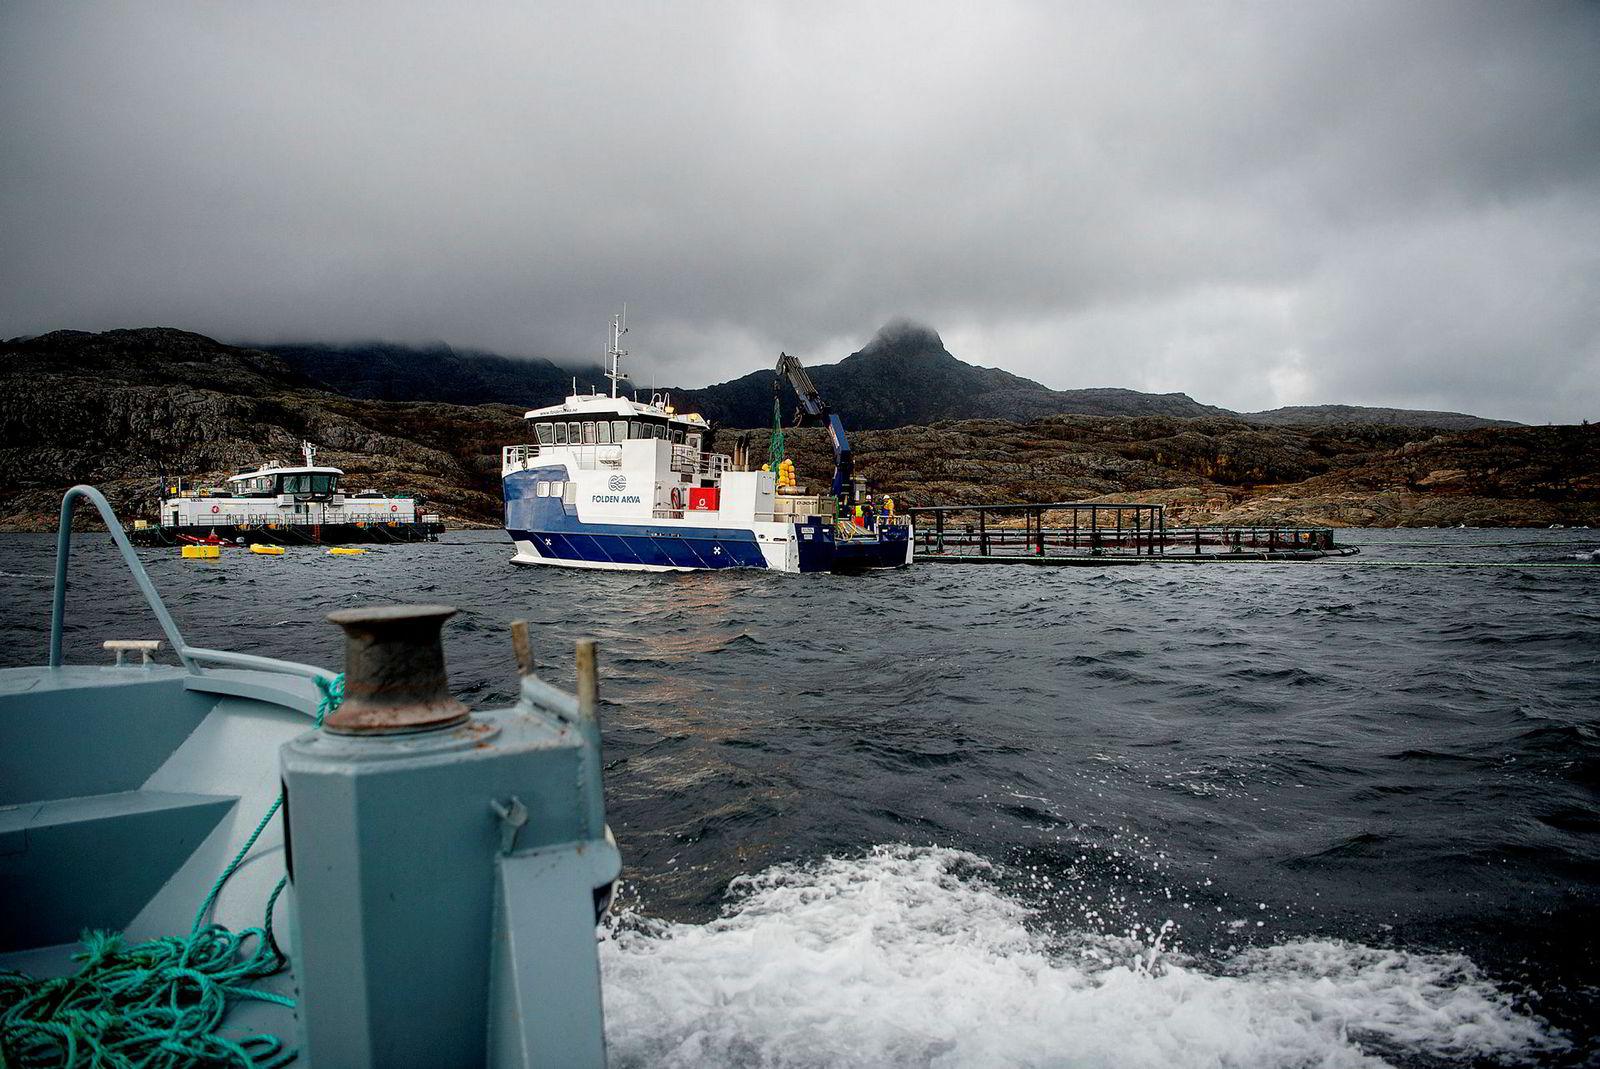 Folden Akvas servicebåt ved holmen Bjørnøya ved øya Landegode, ved oppdrettsmerder til Lofoten Sjøprodukter utenfor Bodø.